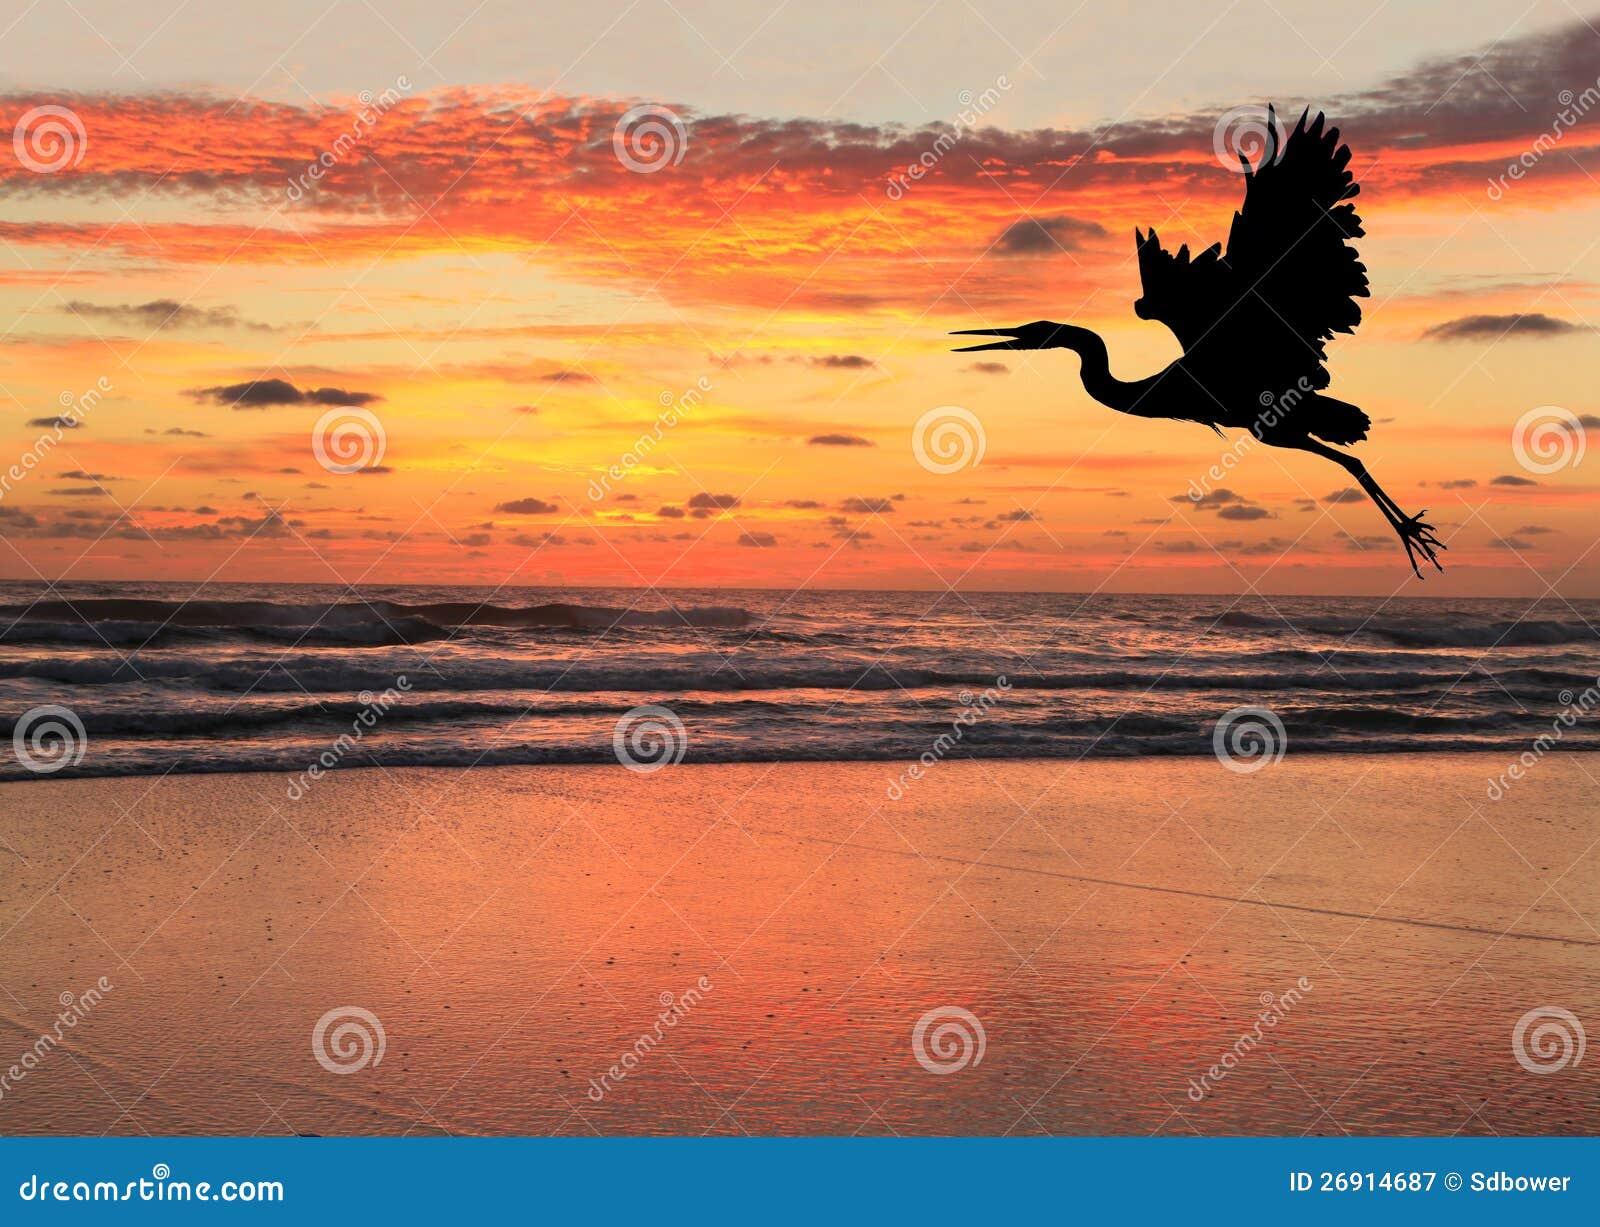 sunrise beach online dating Sunrise beach, mo --the sunrise beach, mo fire department identified the man killed in a house fire on july 4joseph anthony menzel, 52, of sunrise beach died in the fire.